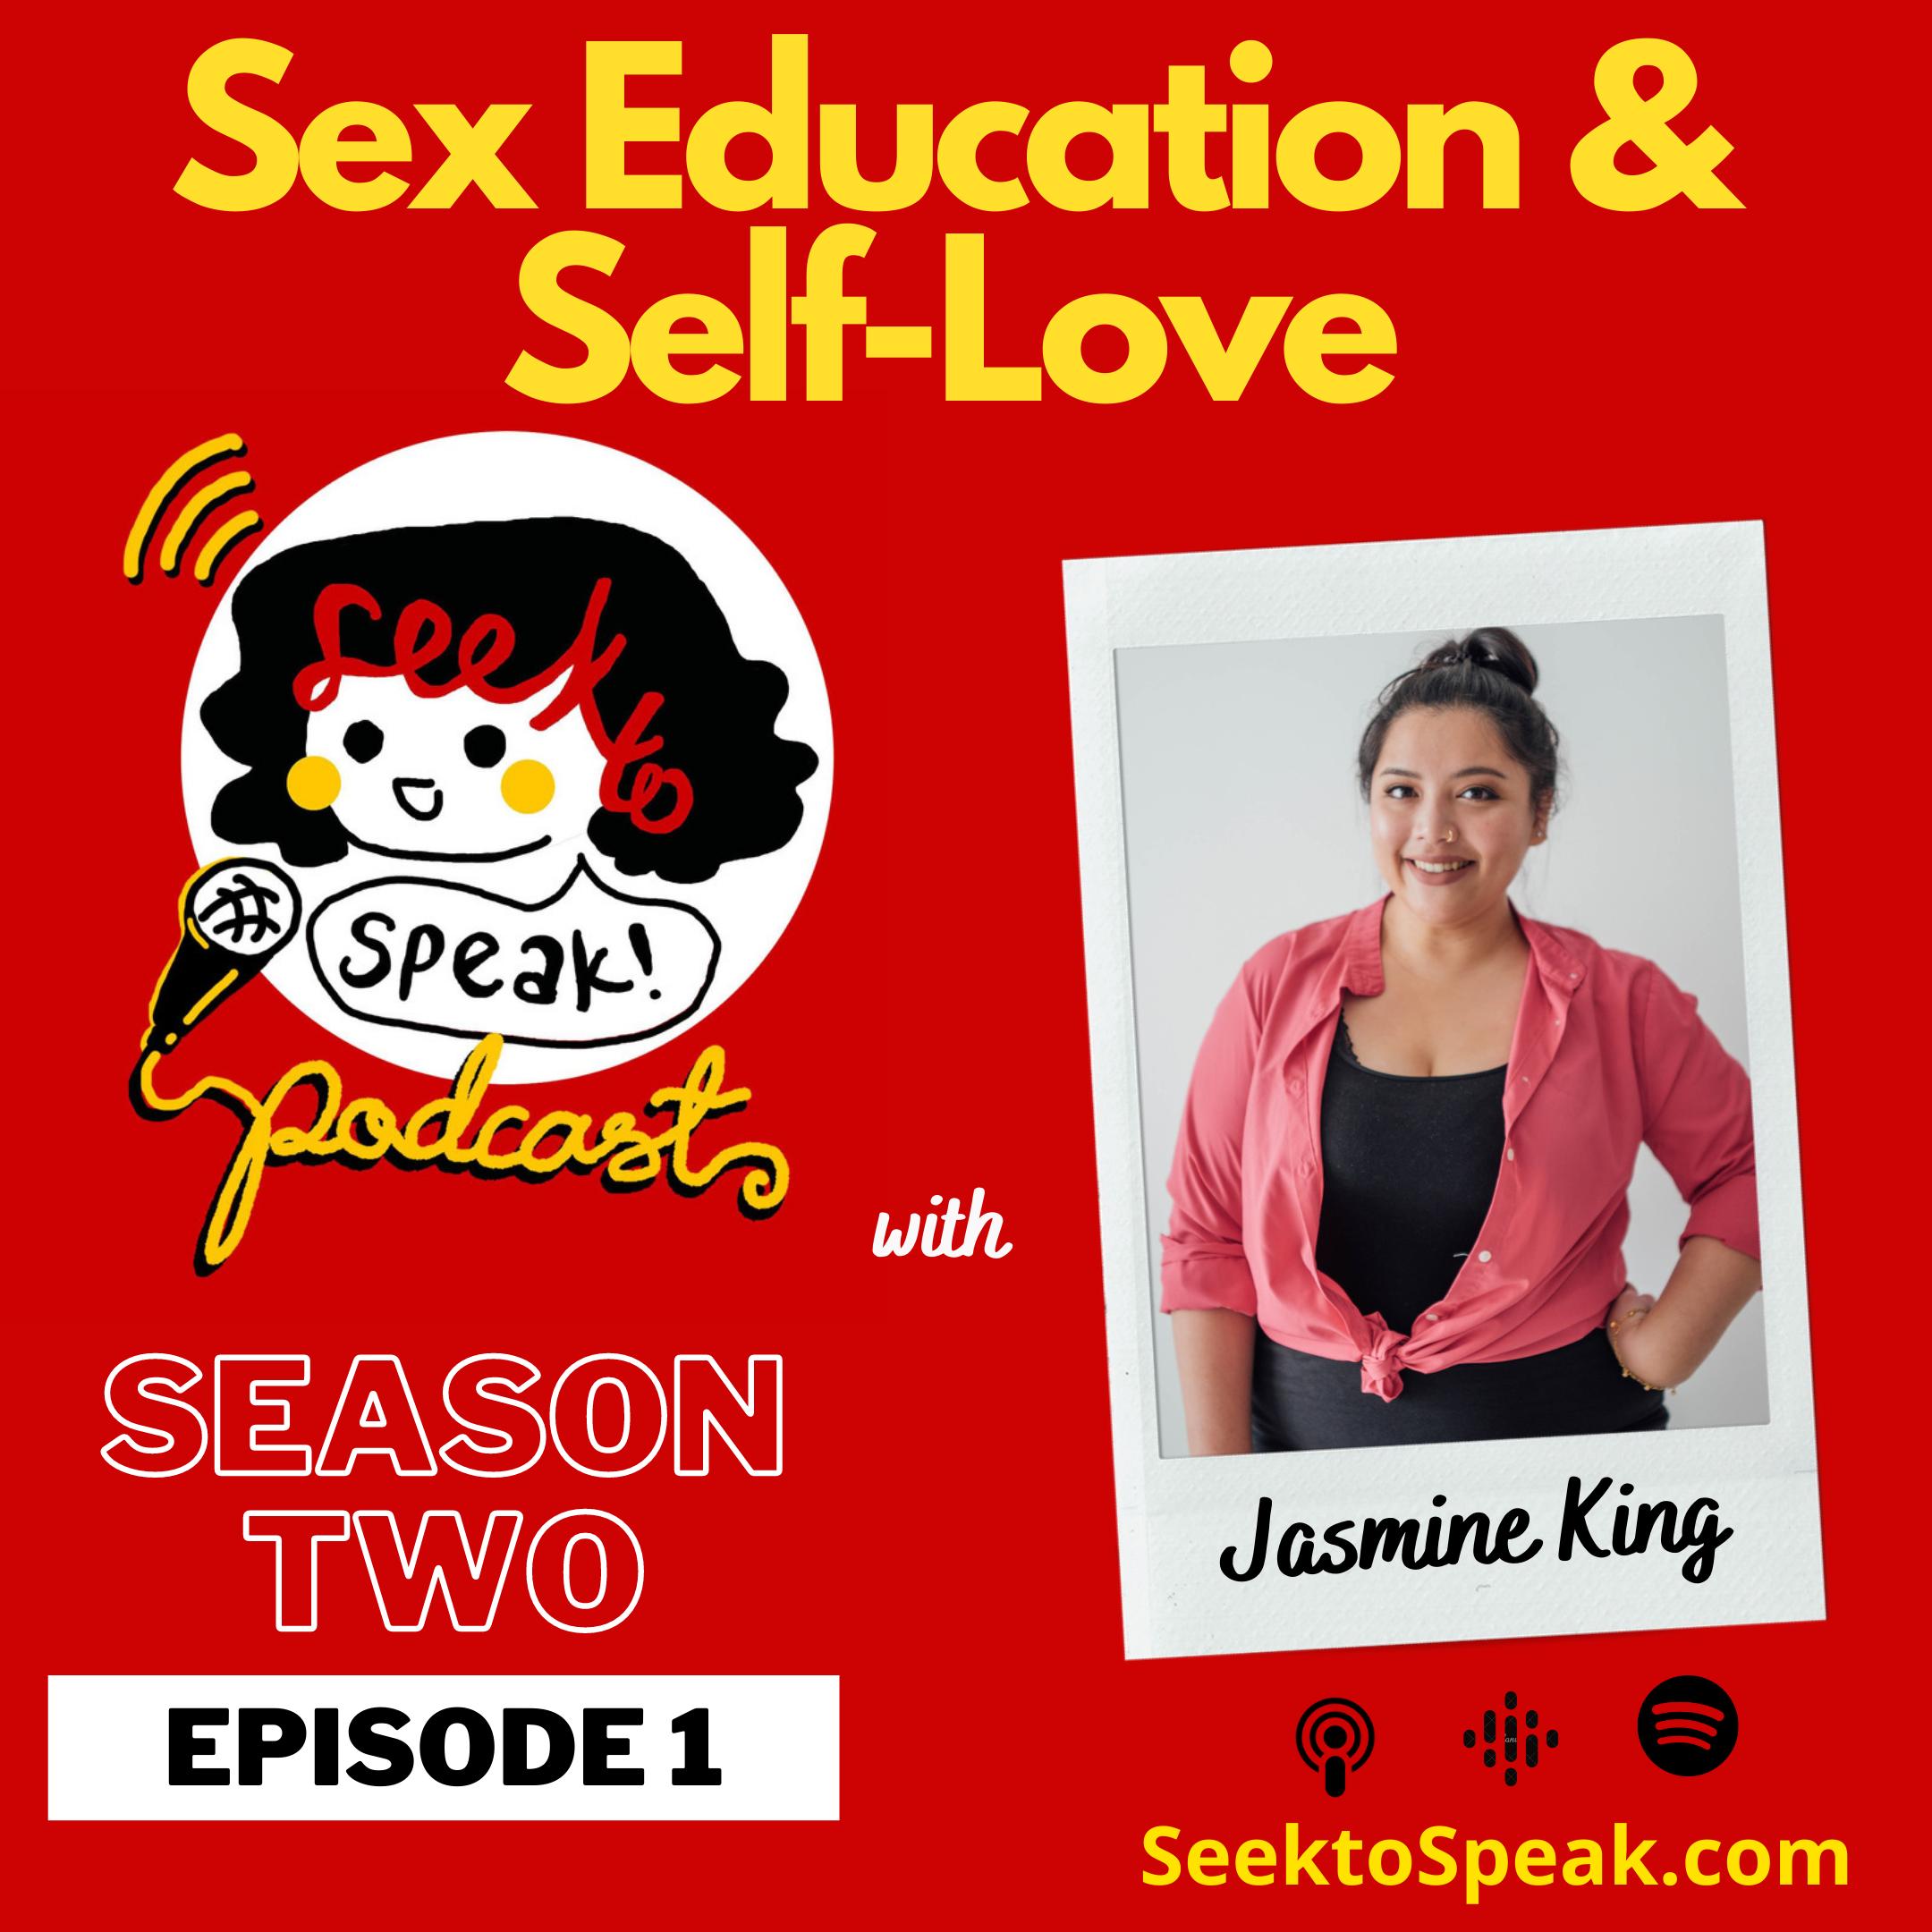 SEASON 2 IS HERE! Ep. 1 on Sex Education & Self-Love with sex positive educator, Jasmine King!